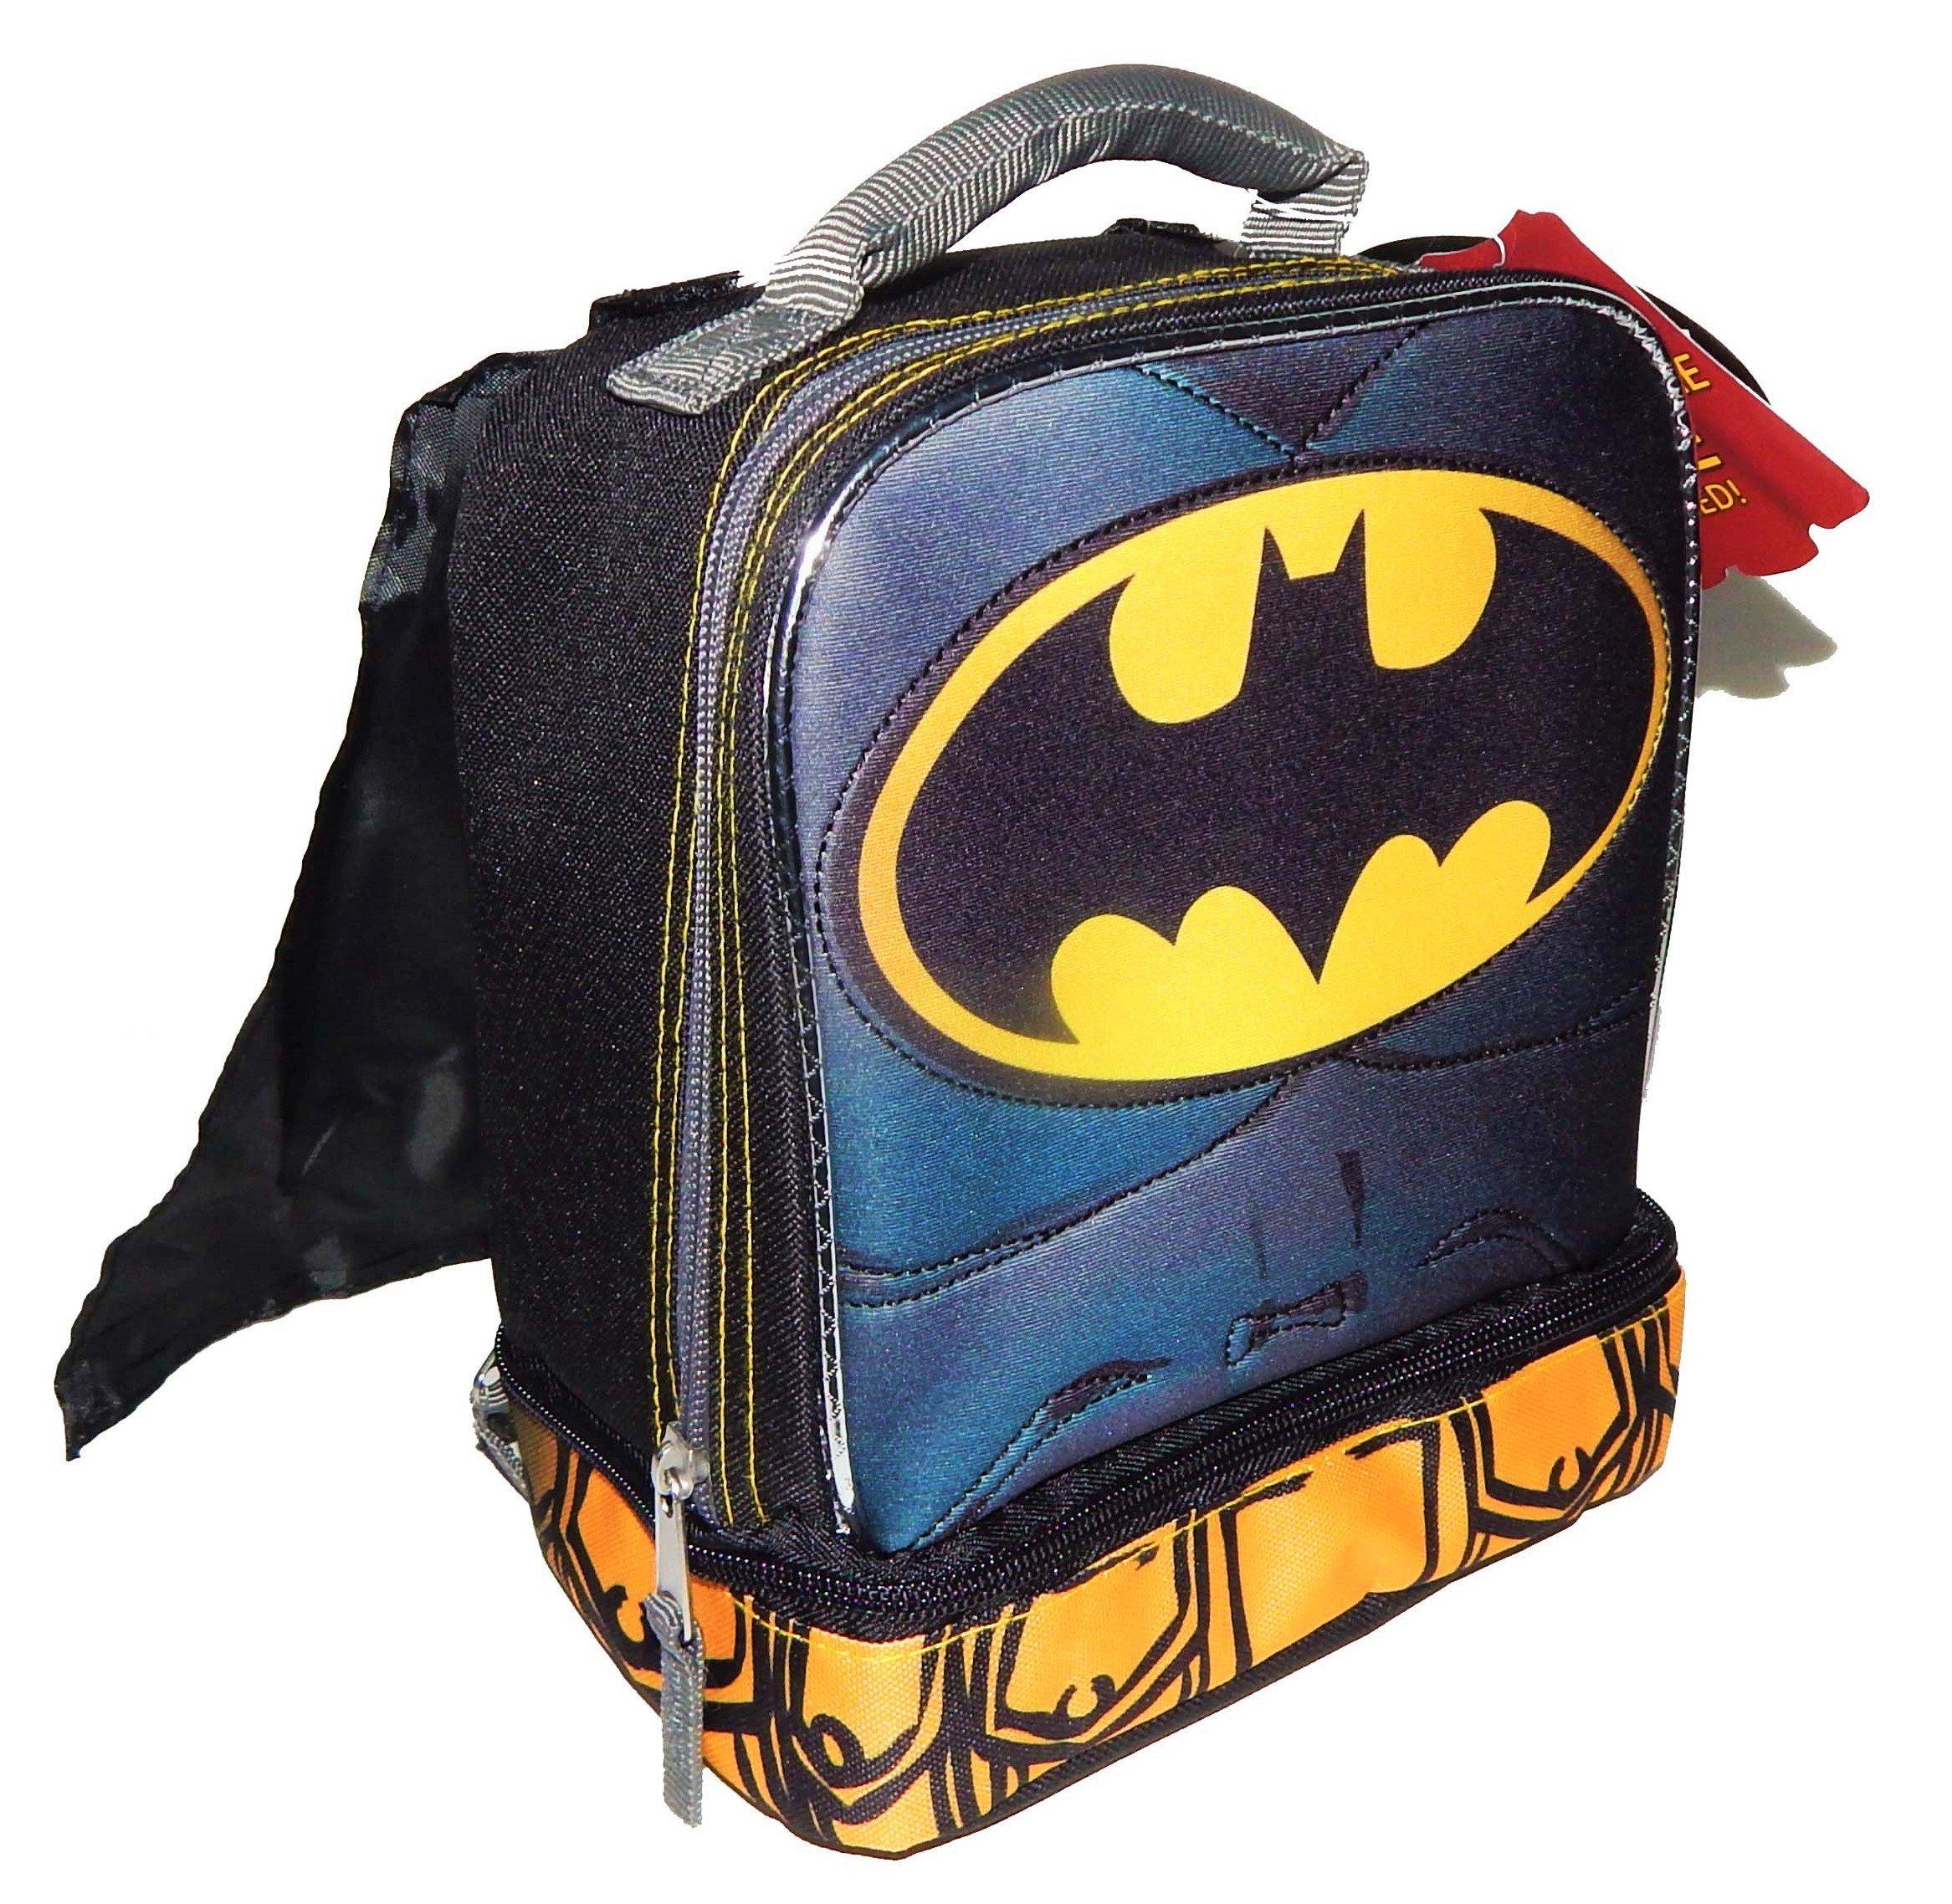 BATMAN DC COMICS Lead Safe Dual Chamber Insulated Lunch Tote Bag Box w/Cape